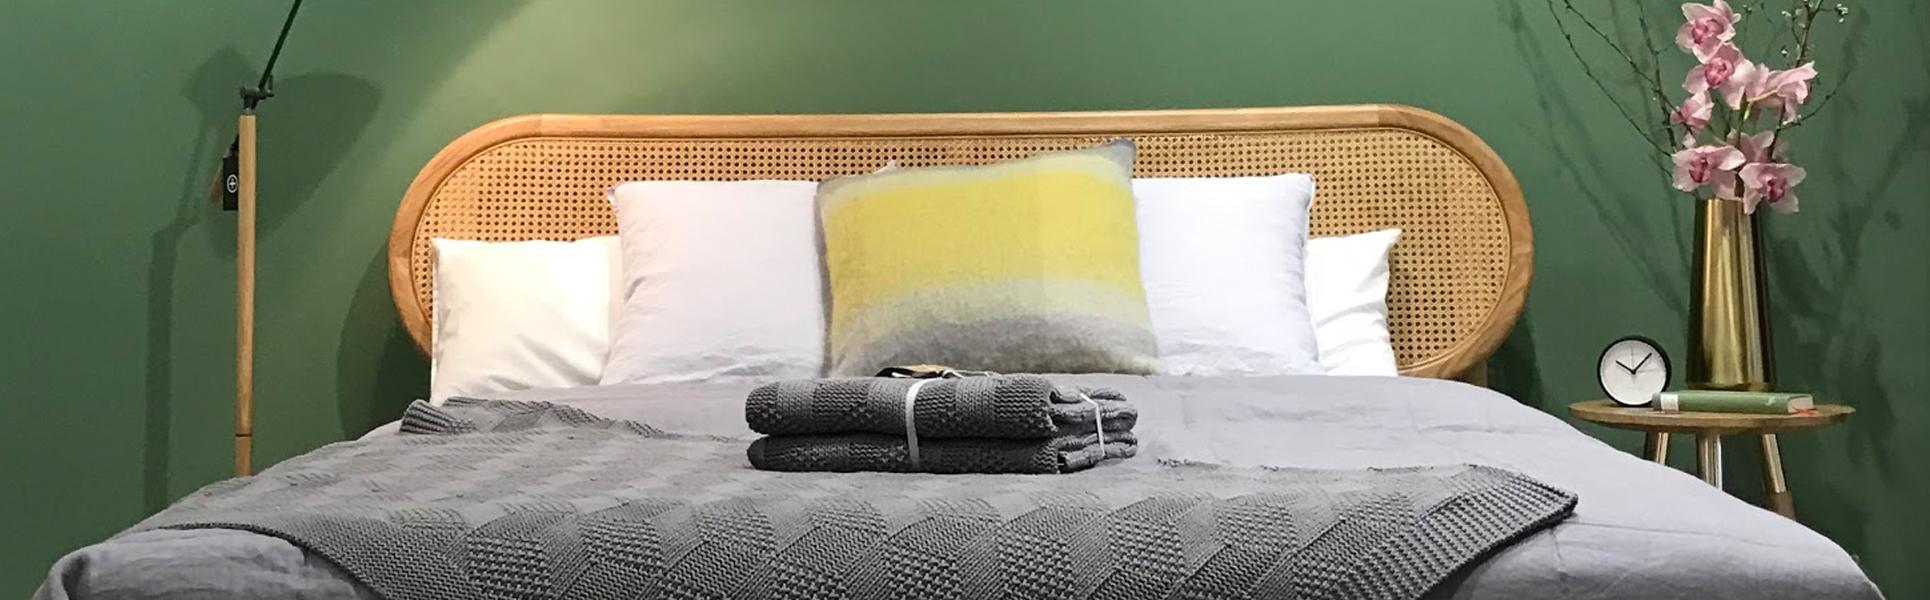 m belgesch ft mit showroom in berlin made com. Black Bedroom Furniture Sets. Home Design Ideas